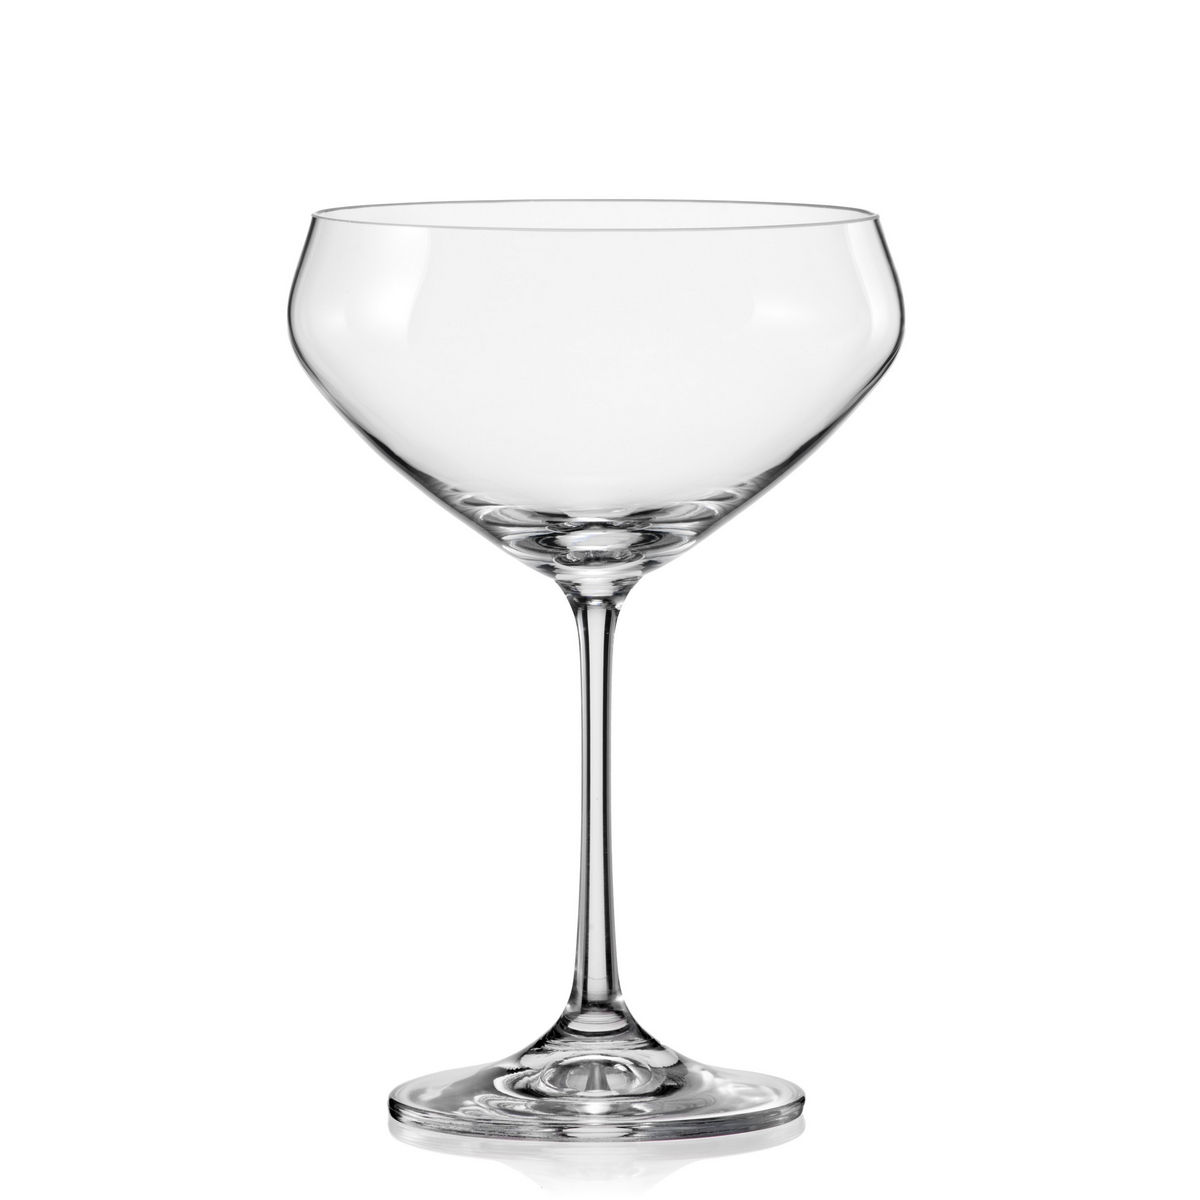 BAR Set 4 pahare cristalin martini/inghetata 340 ml